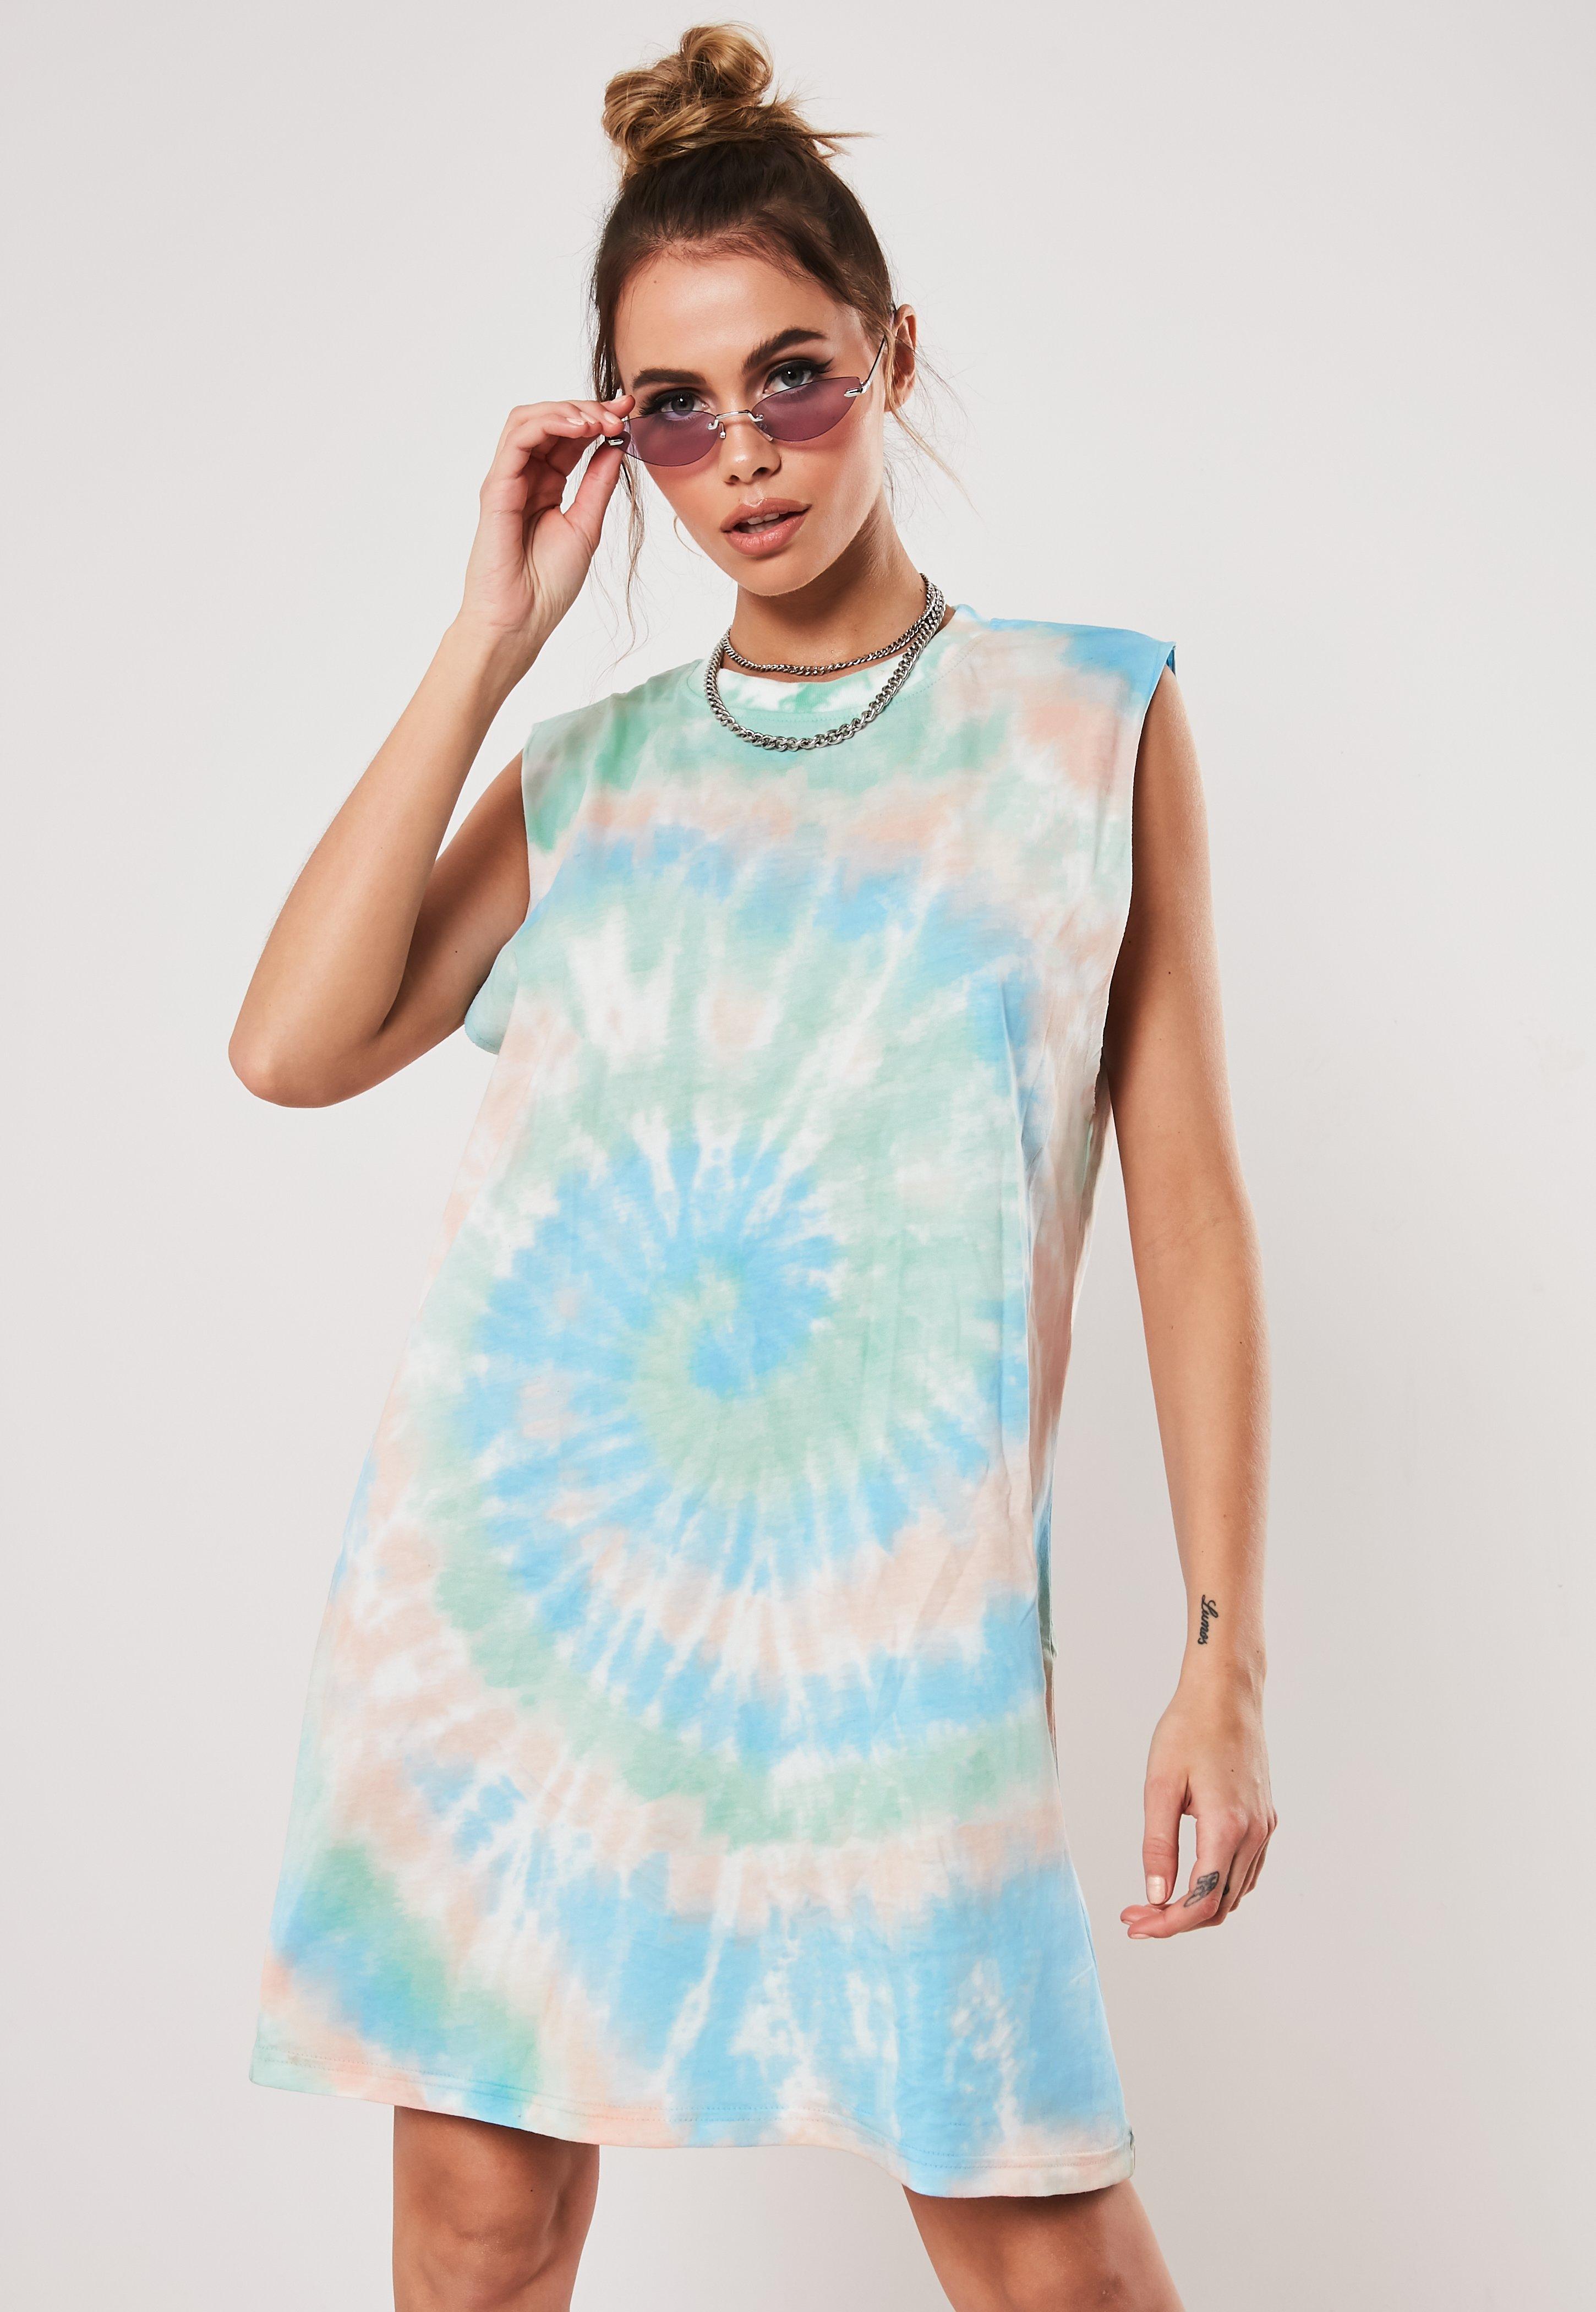 01b54a8e4c0f6 T-Shirt Dresses | Printed & Slogan Dresses - Missguided